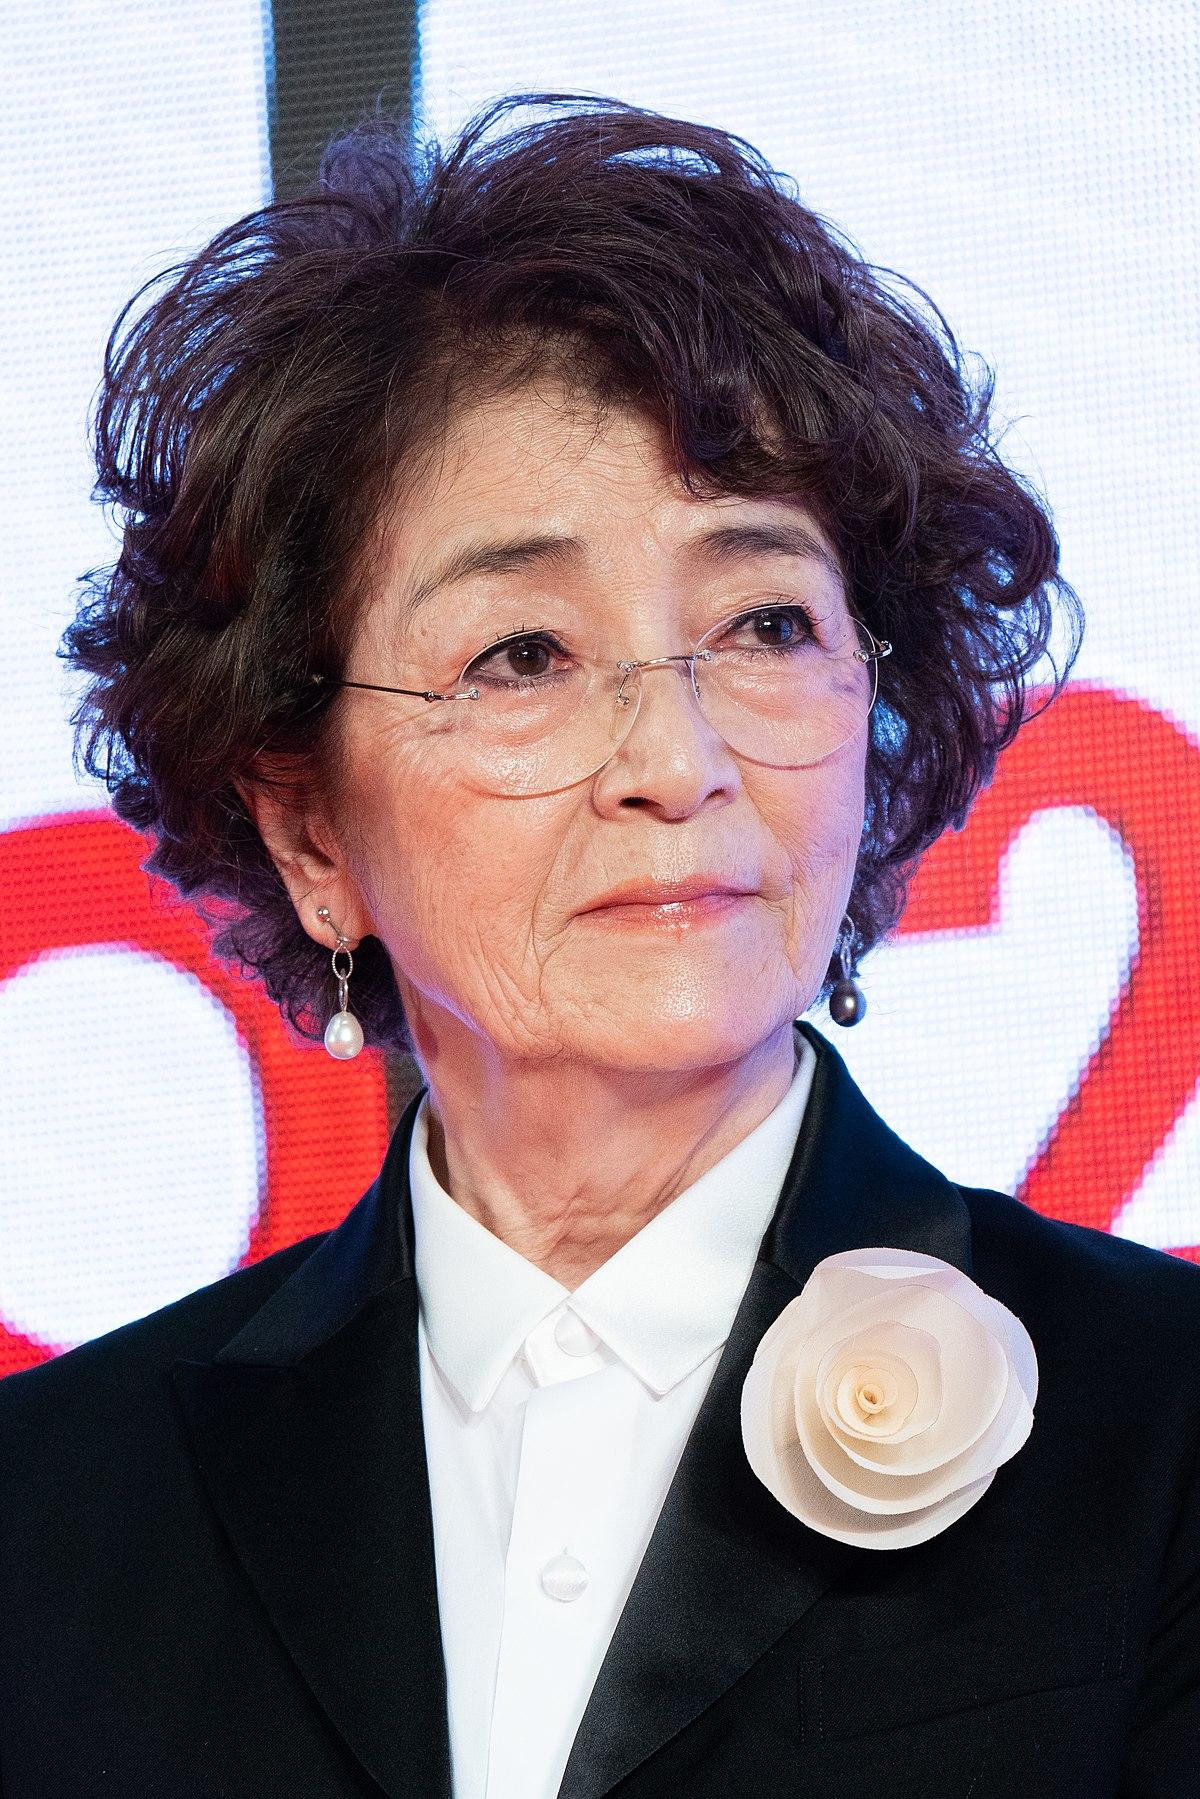 倍賞千恵子 - Wikipedia